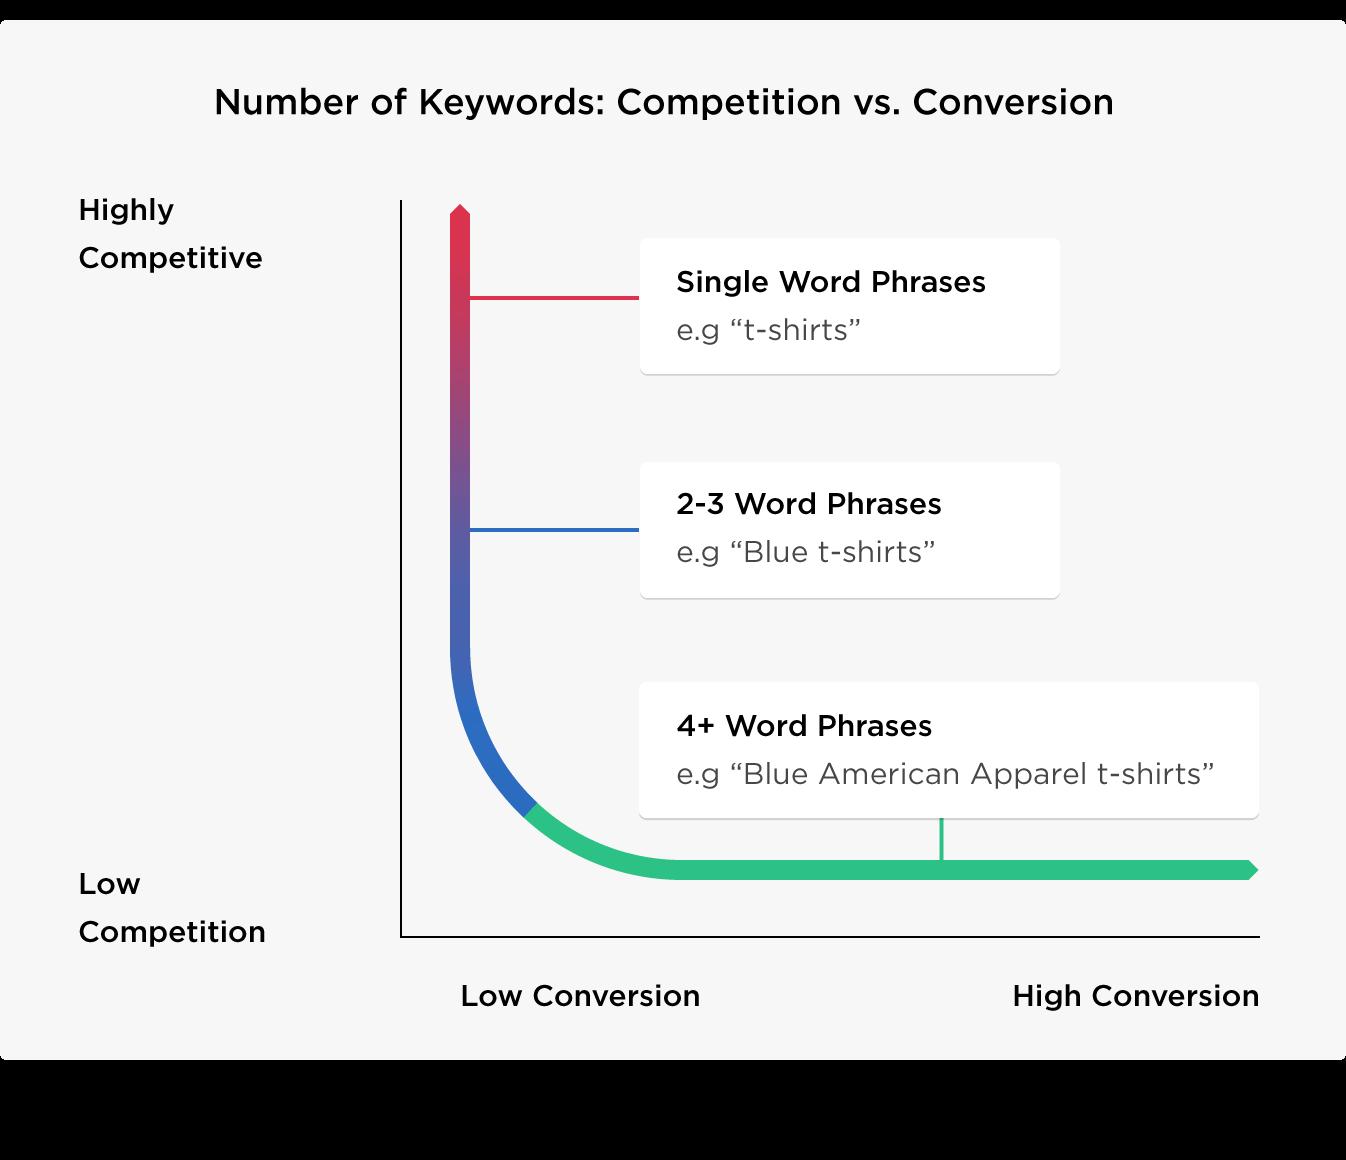 1585025605 2023 ompetition versus conversion